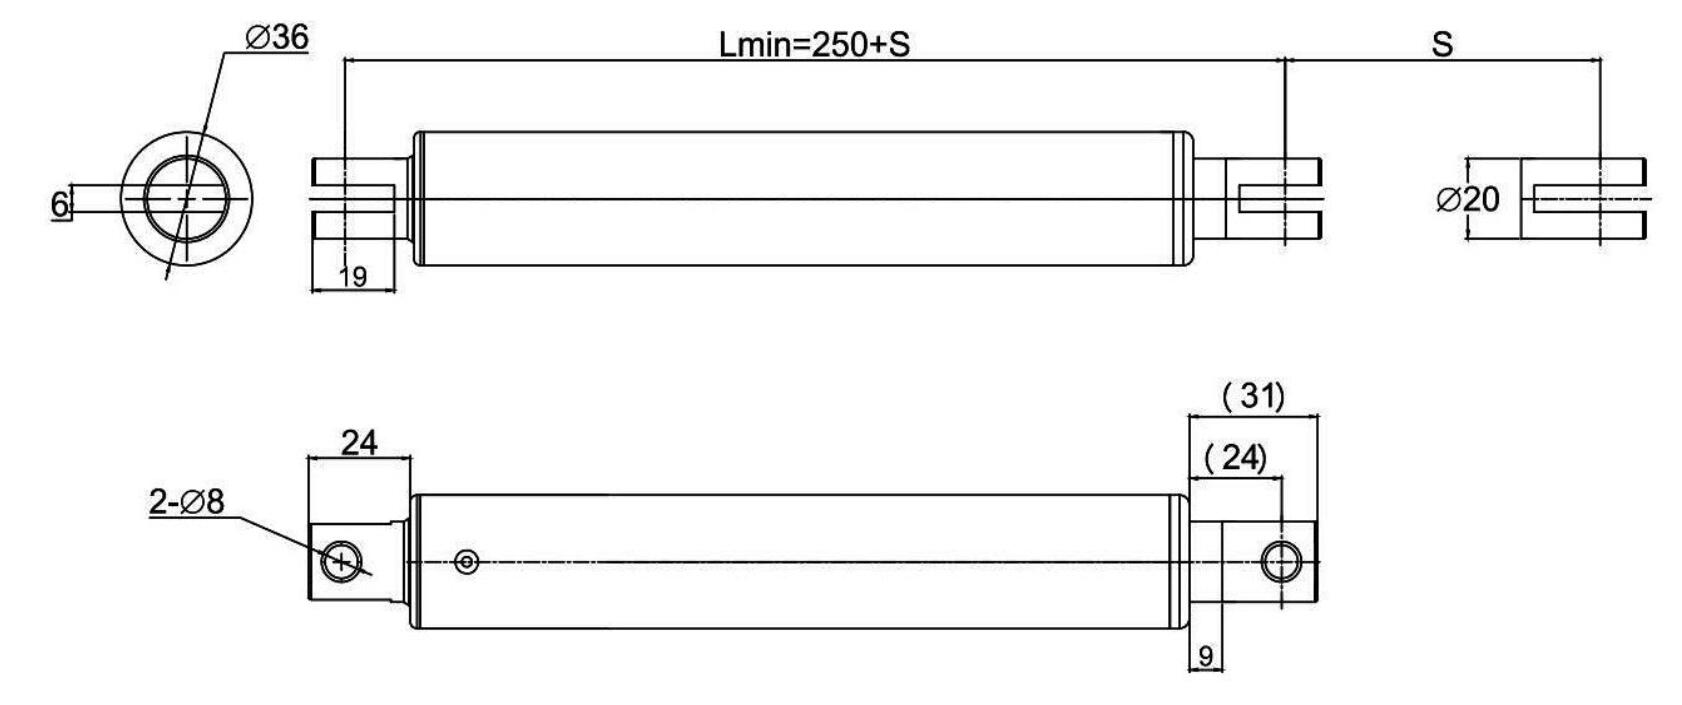 kc36-tubular-linear-actuator-3.jpg